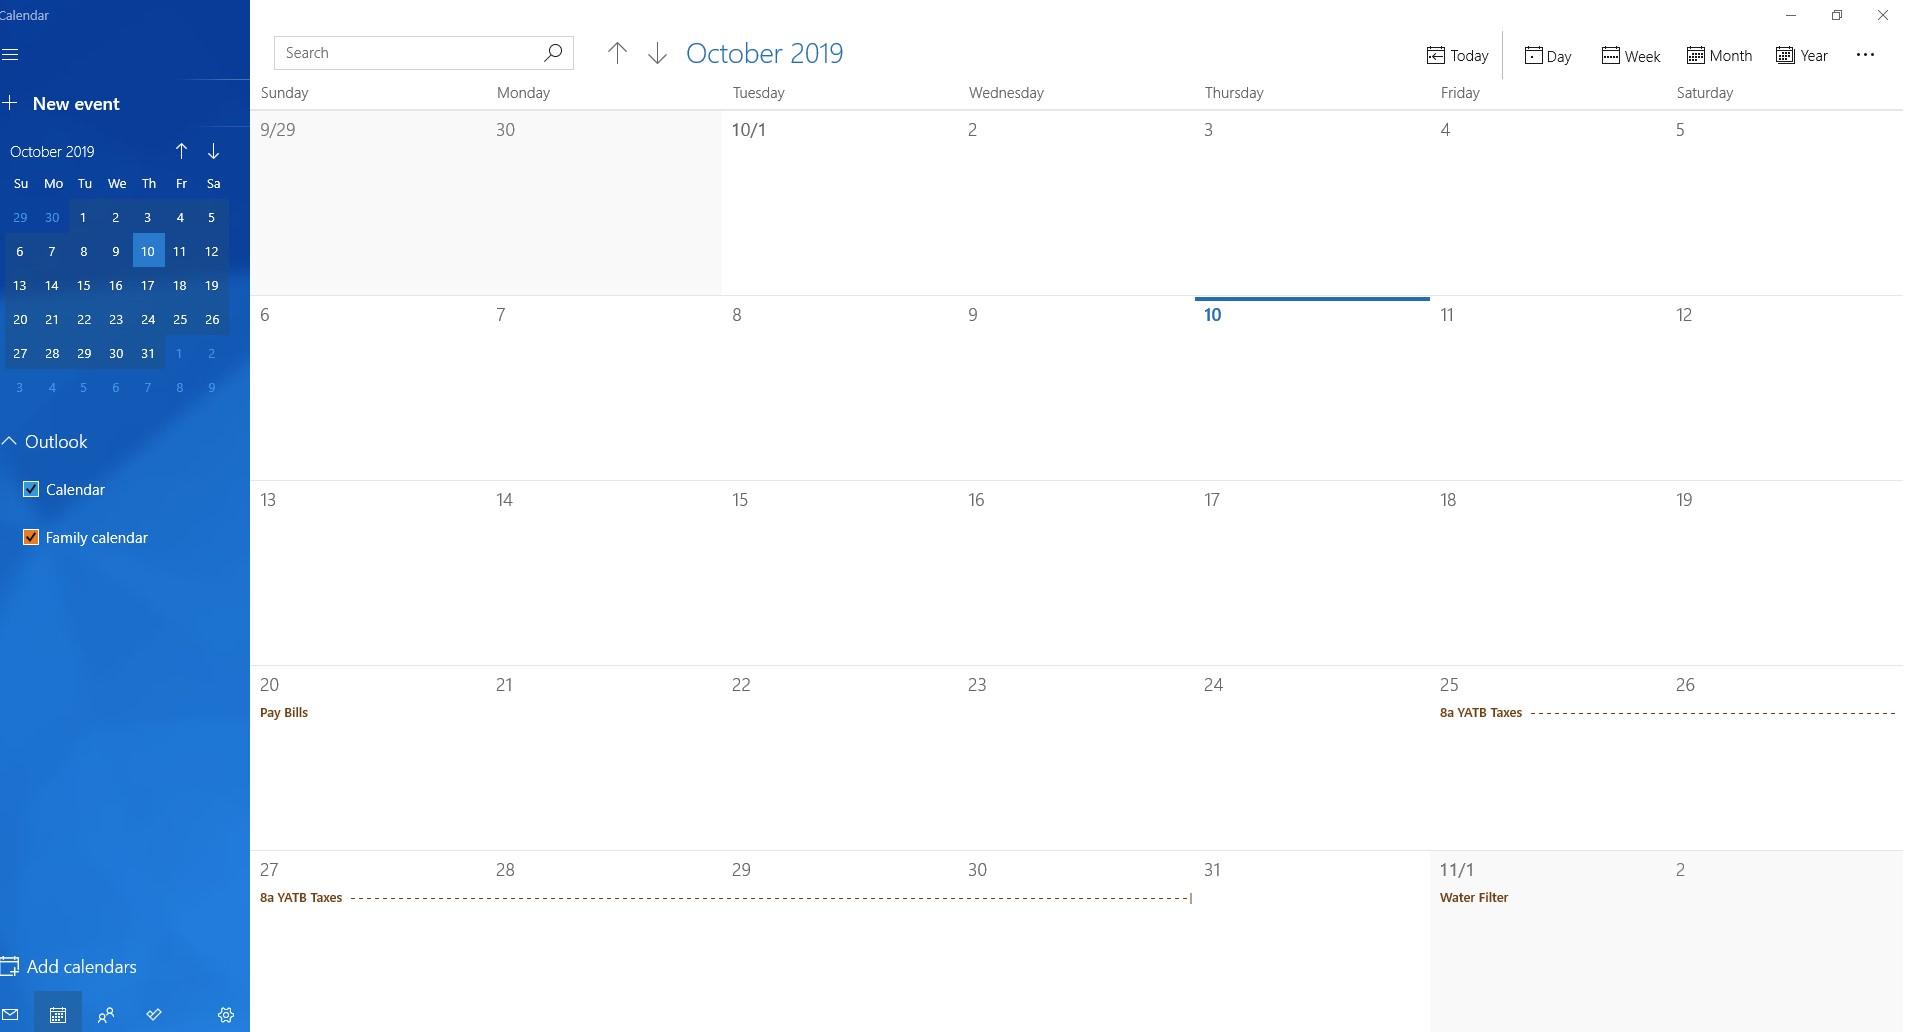 Calendar events showing only dashed lines 923ceea3-2cf0-47e9-8e03-133b590a17fd?upload=true.jpg